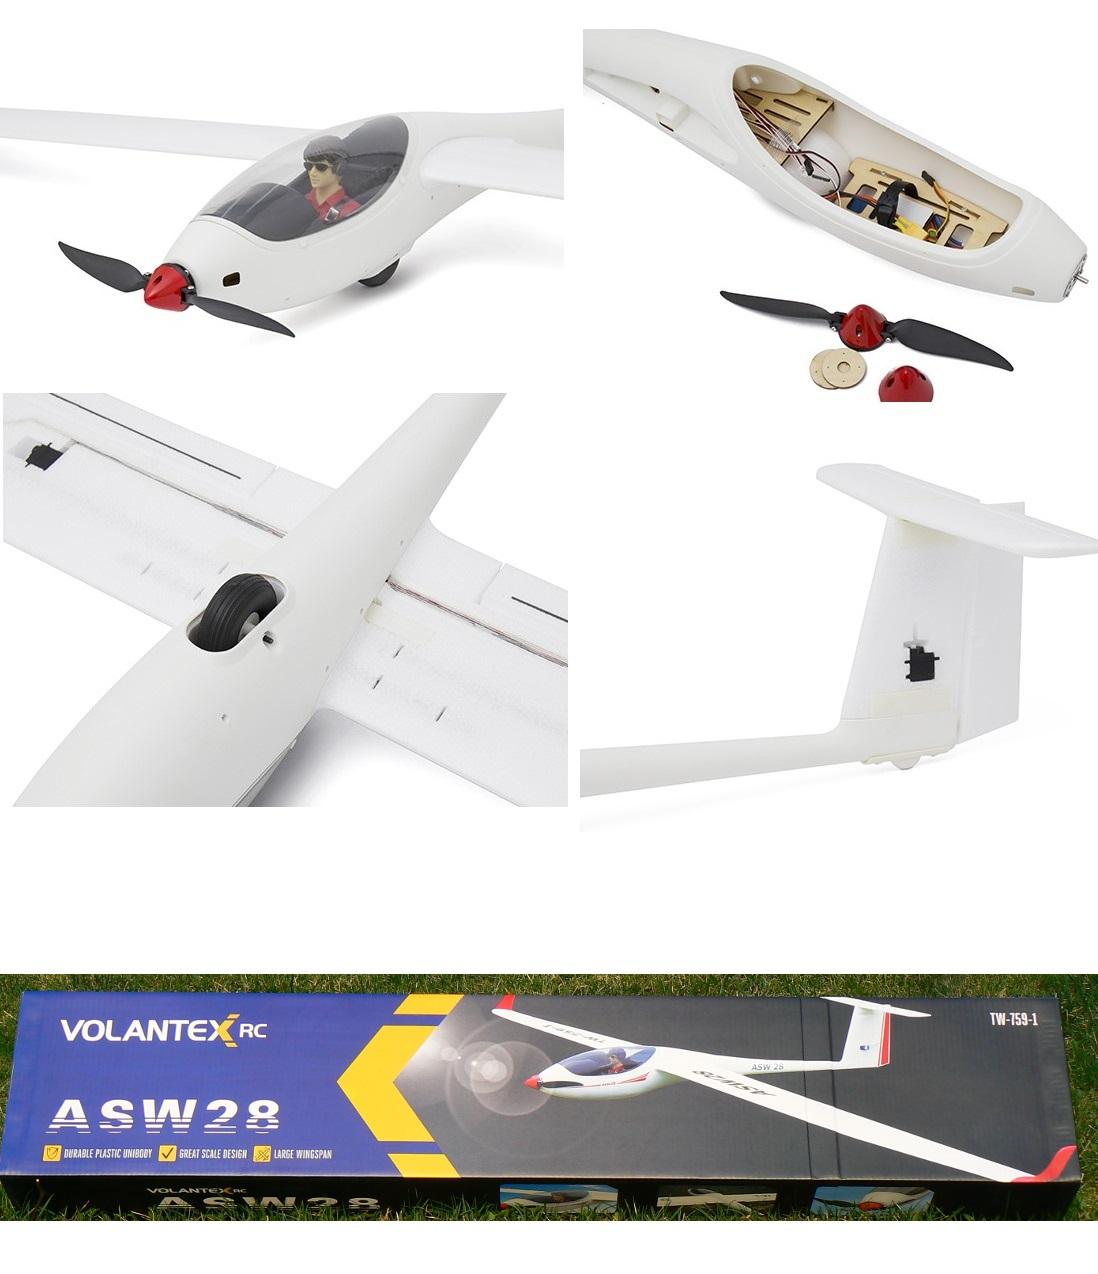 Volantex RC ASW28 V2 2 6m Plastic Unibody Scale Glider 759-1 PNP    VolantexRC